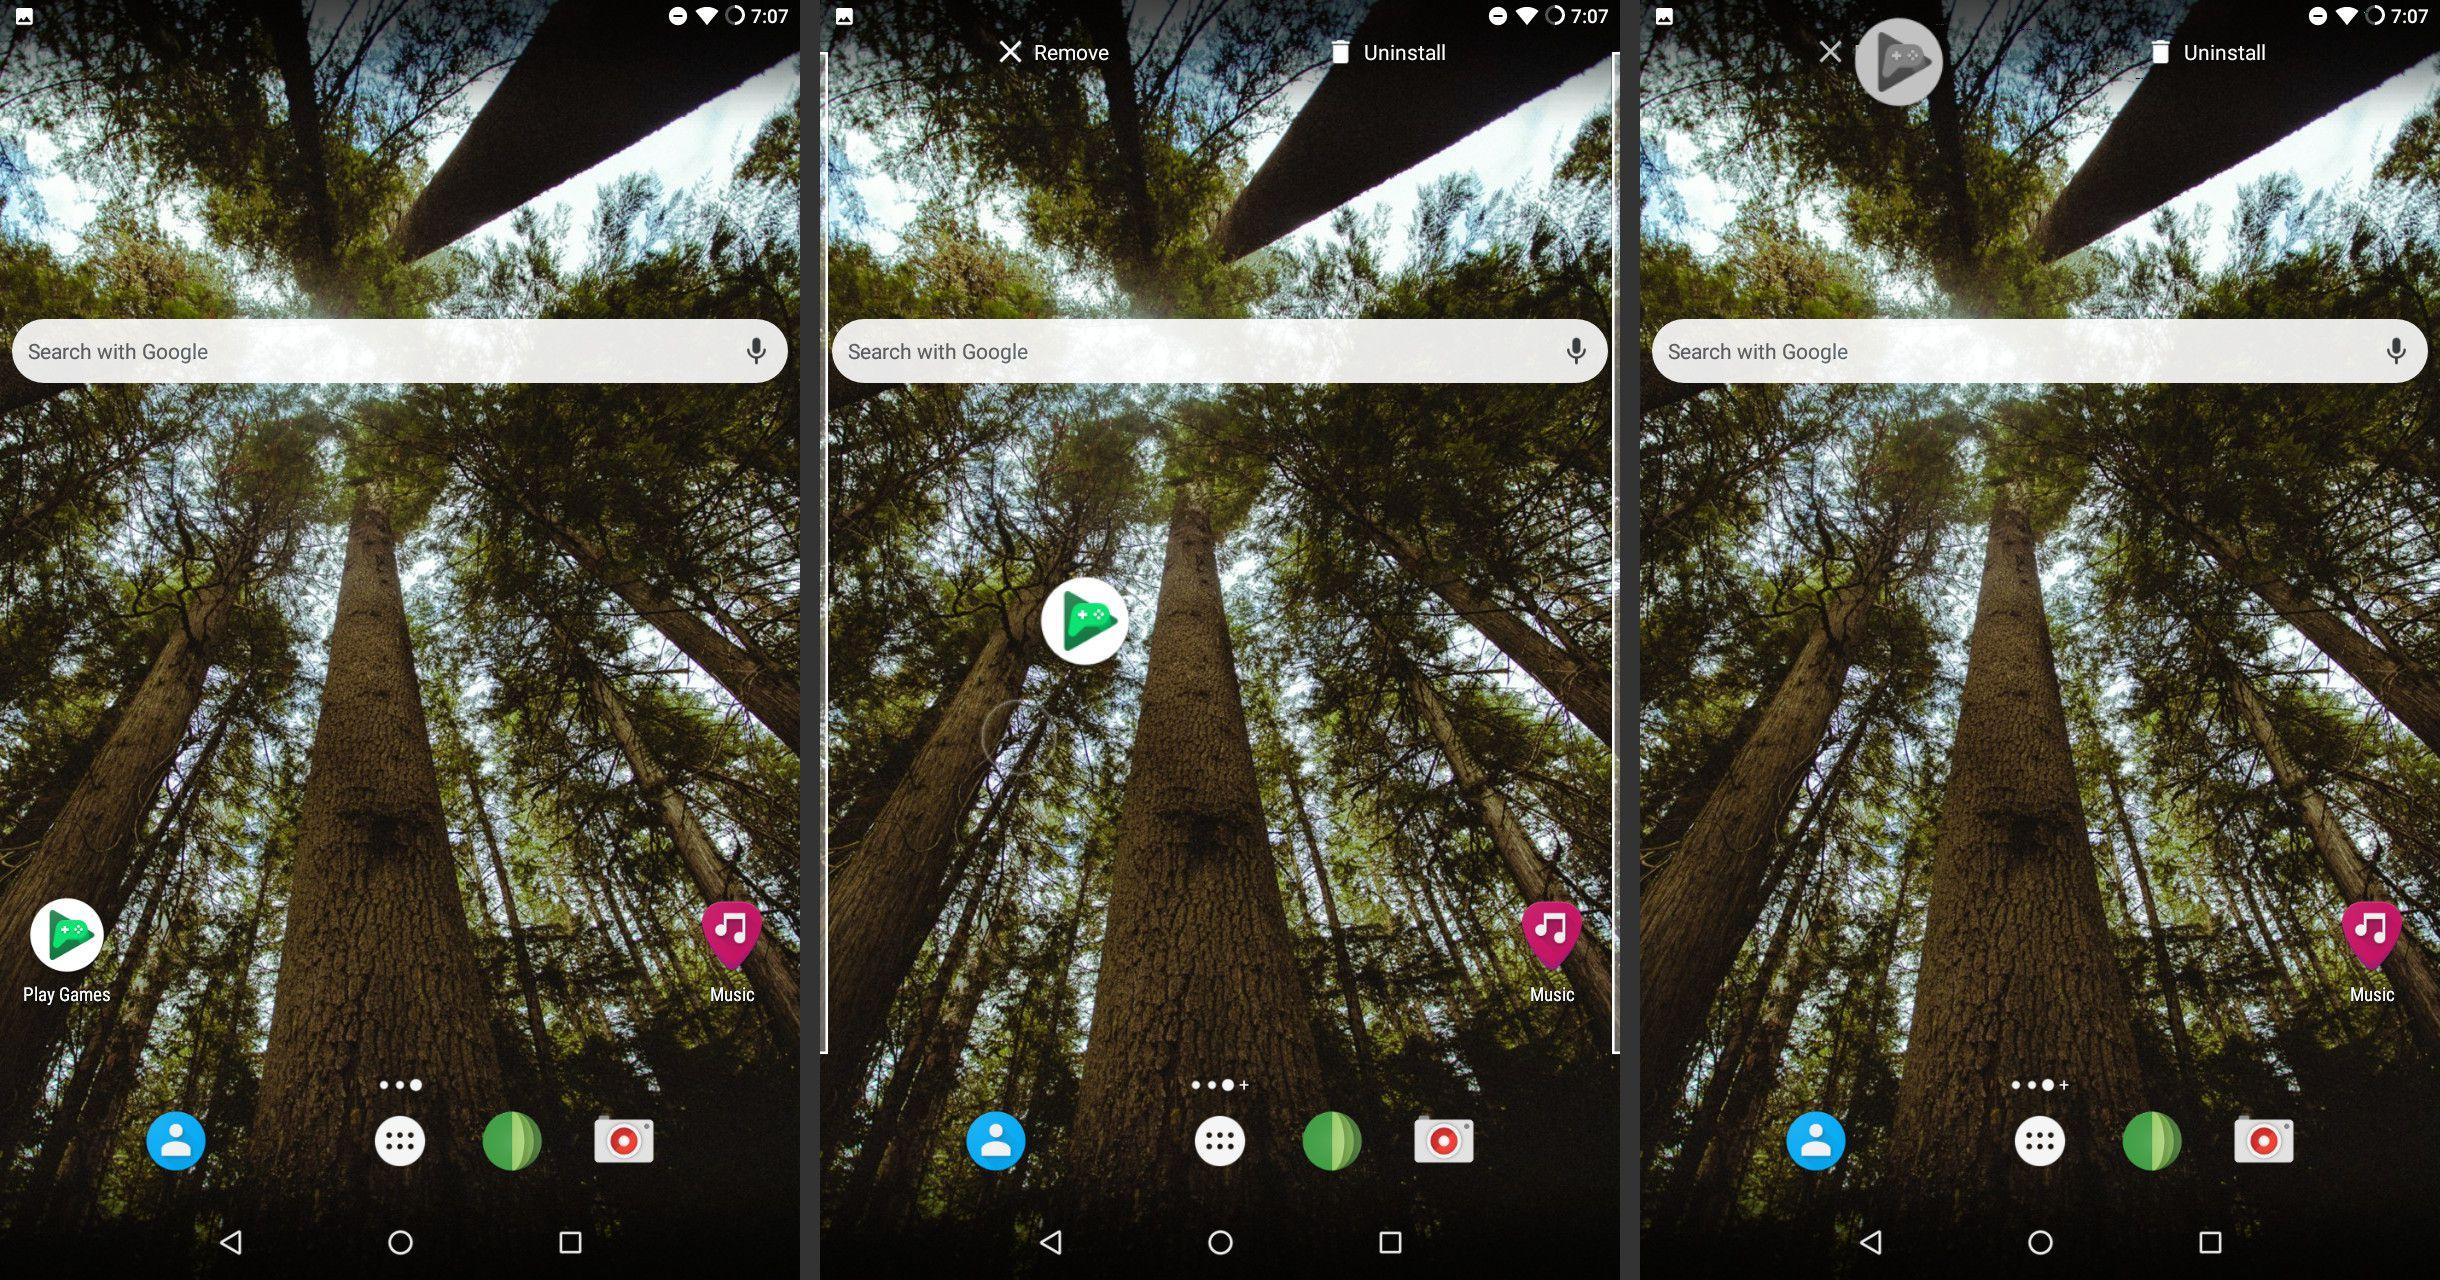 Android remove app icon